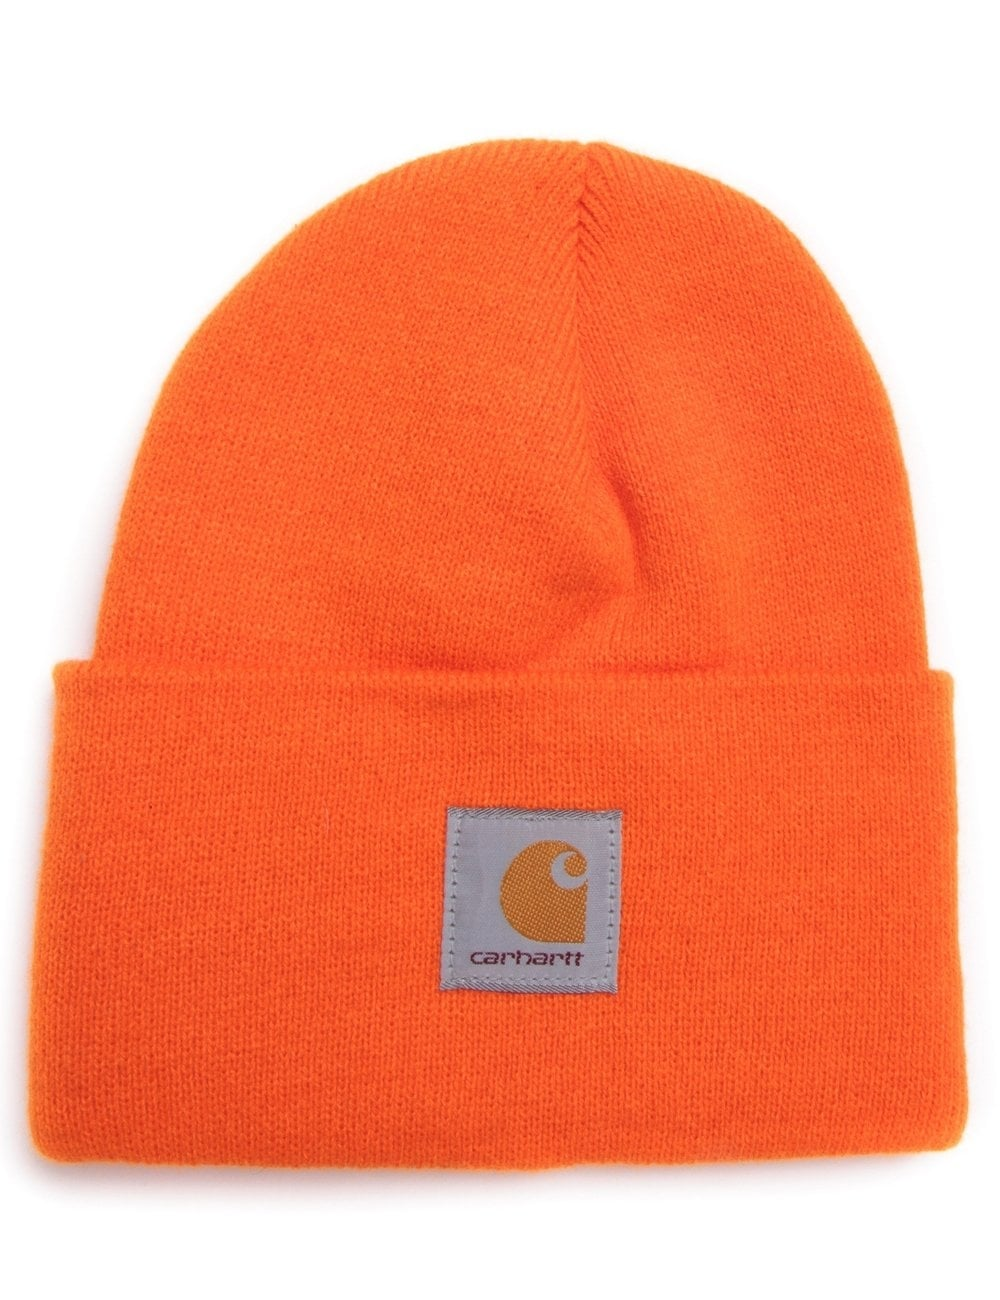 Carhartt WIP Acrylic Watch Hat - US Athletic Orange - Accessories ... 514383dcabdf